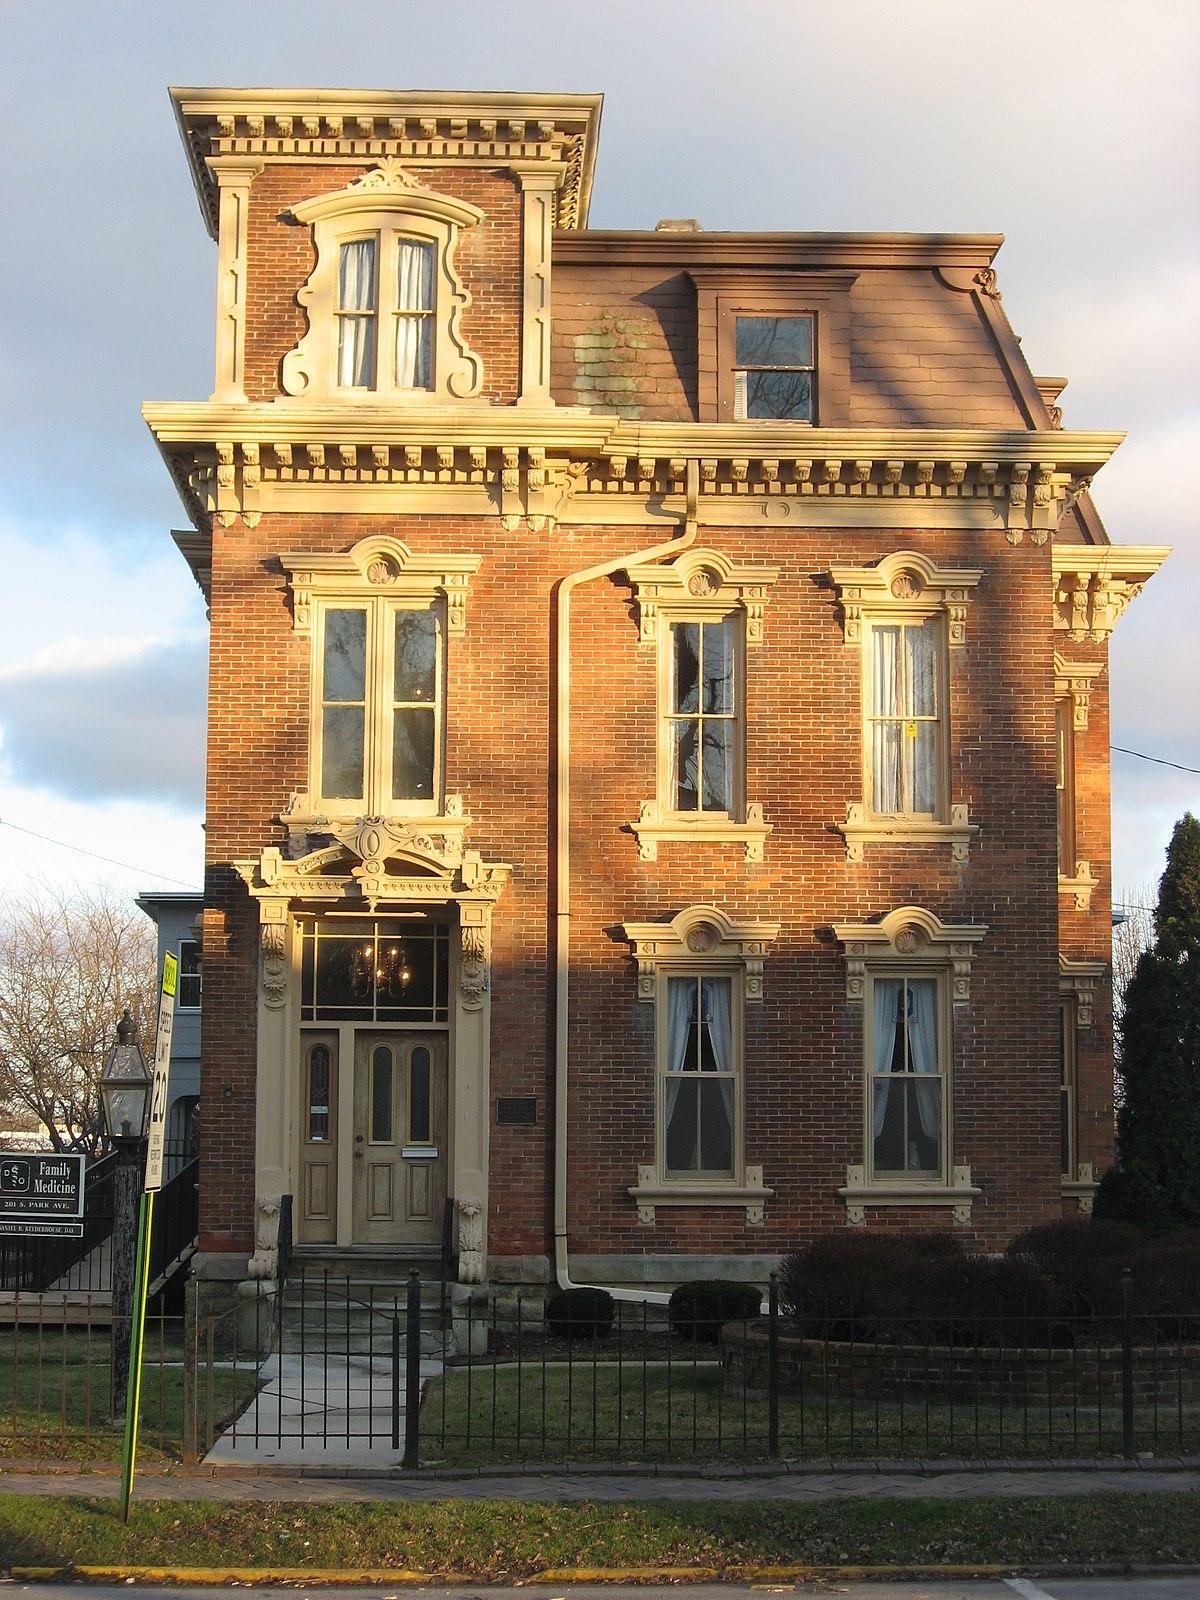 Frederick fabing house wikidata for Fredrick house